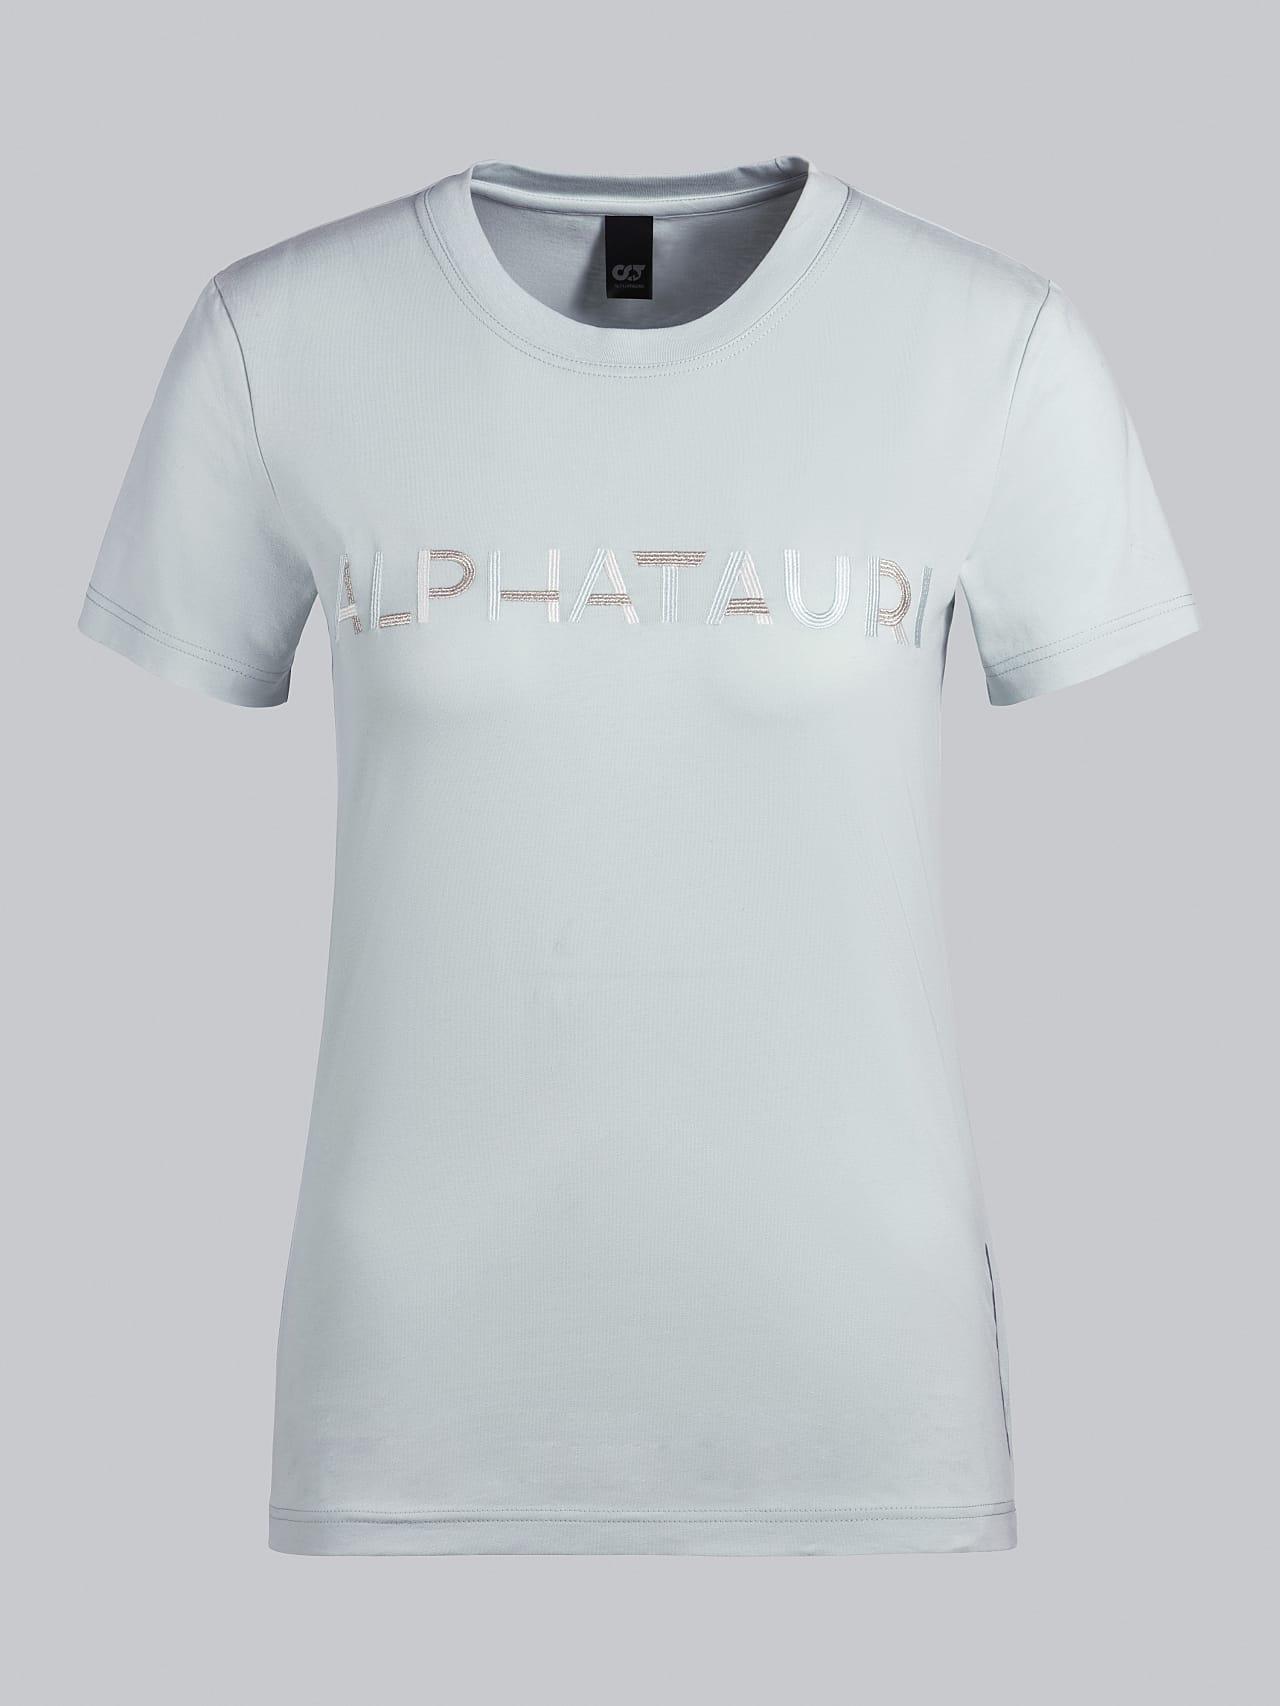 JOCTI V3.Y5.02 Logo T-Shirt Pale Blue  Back Alpha Tauri